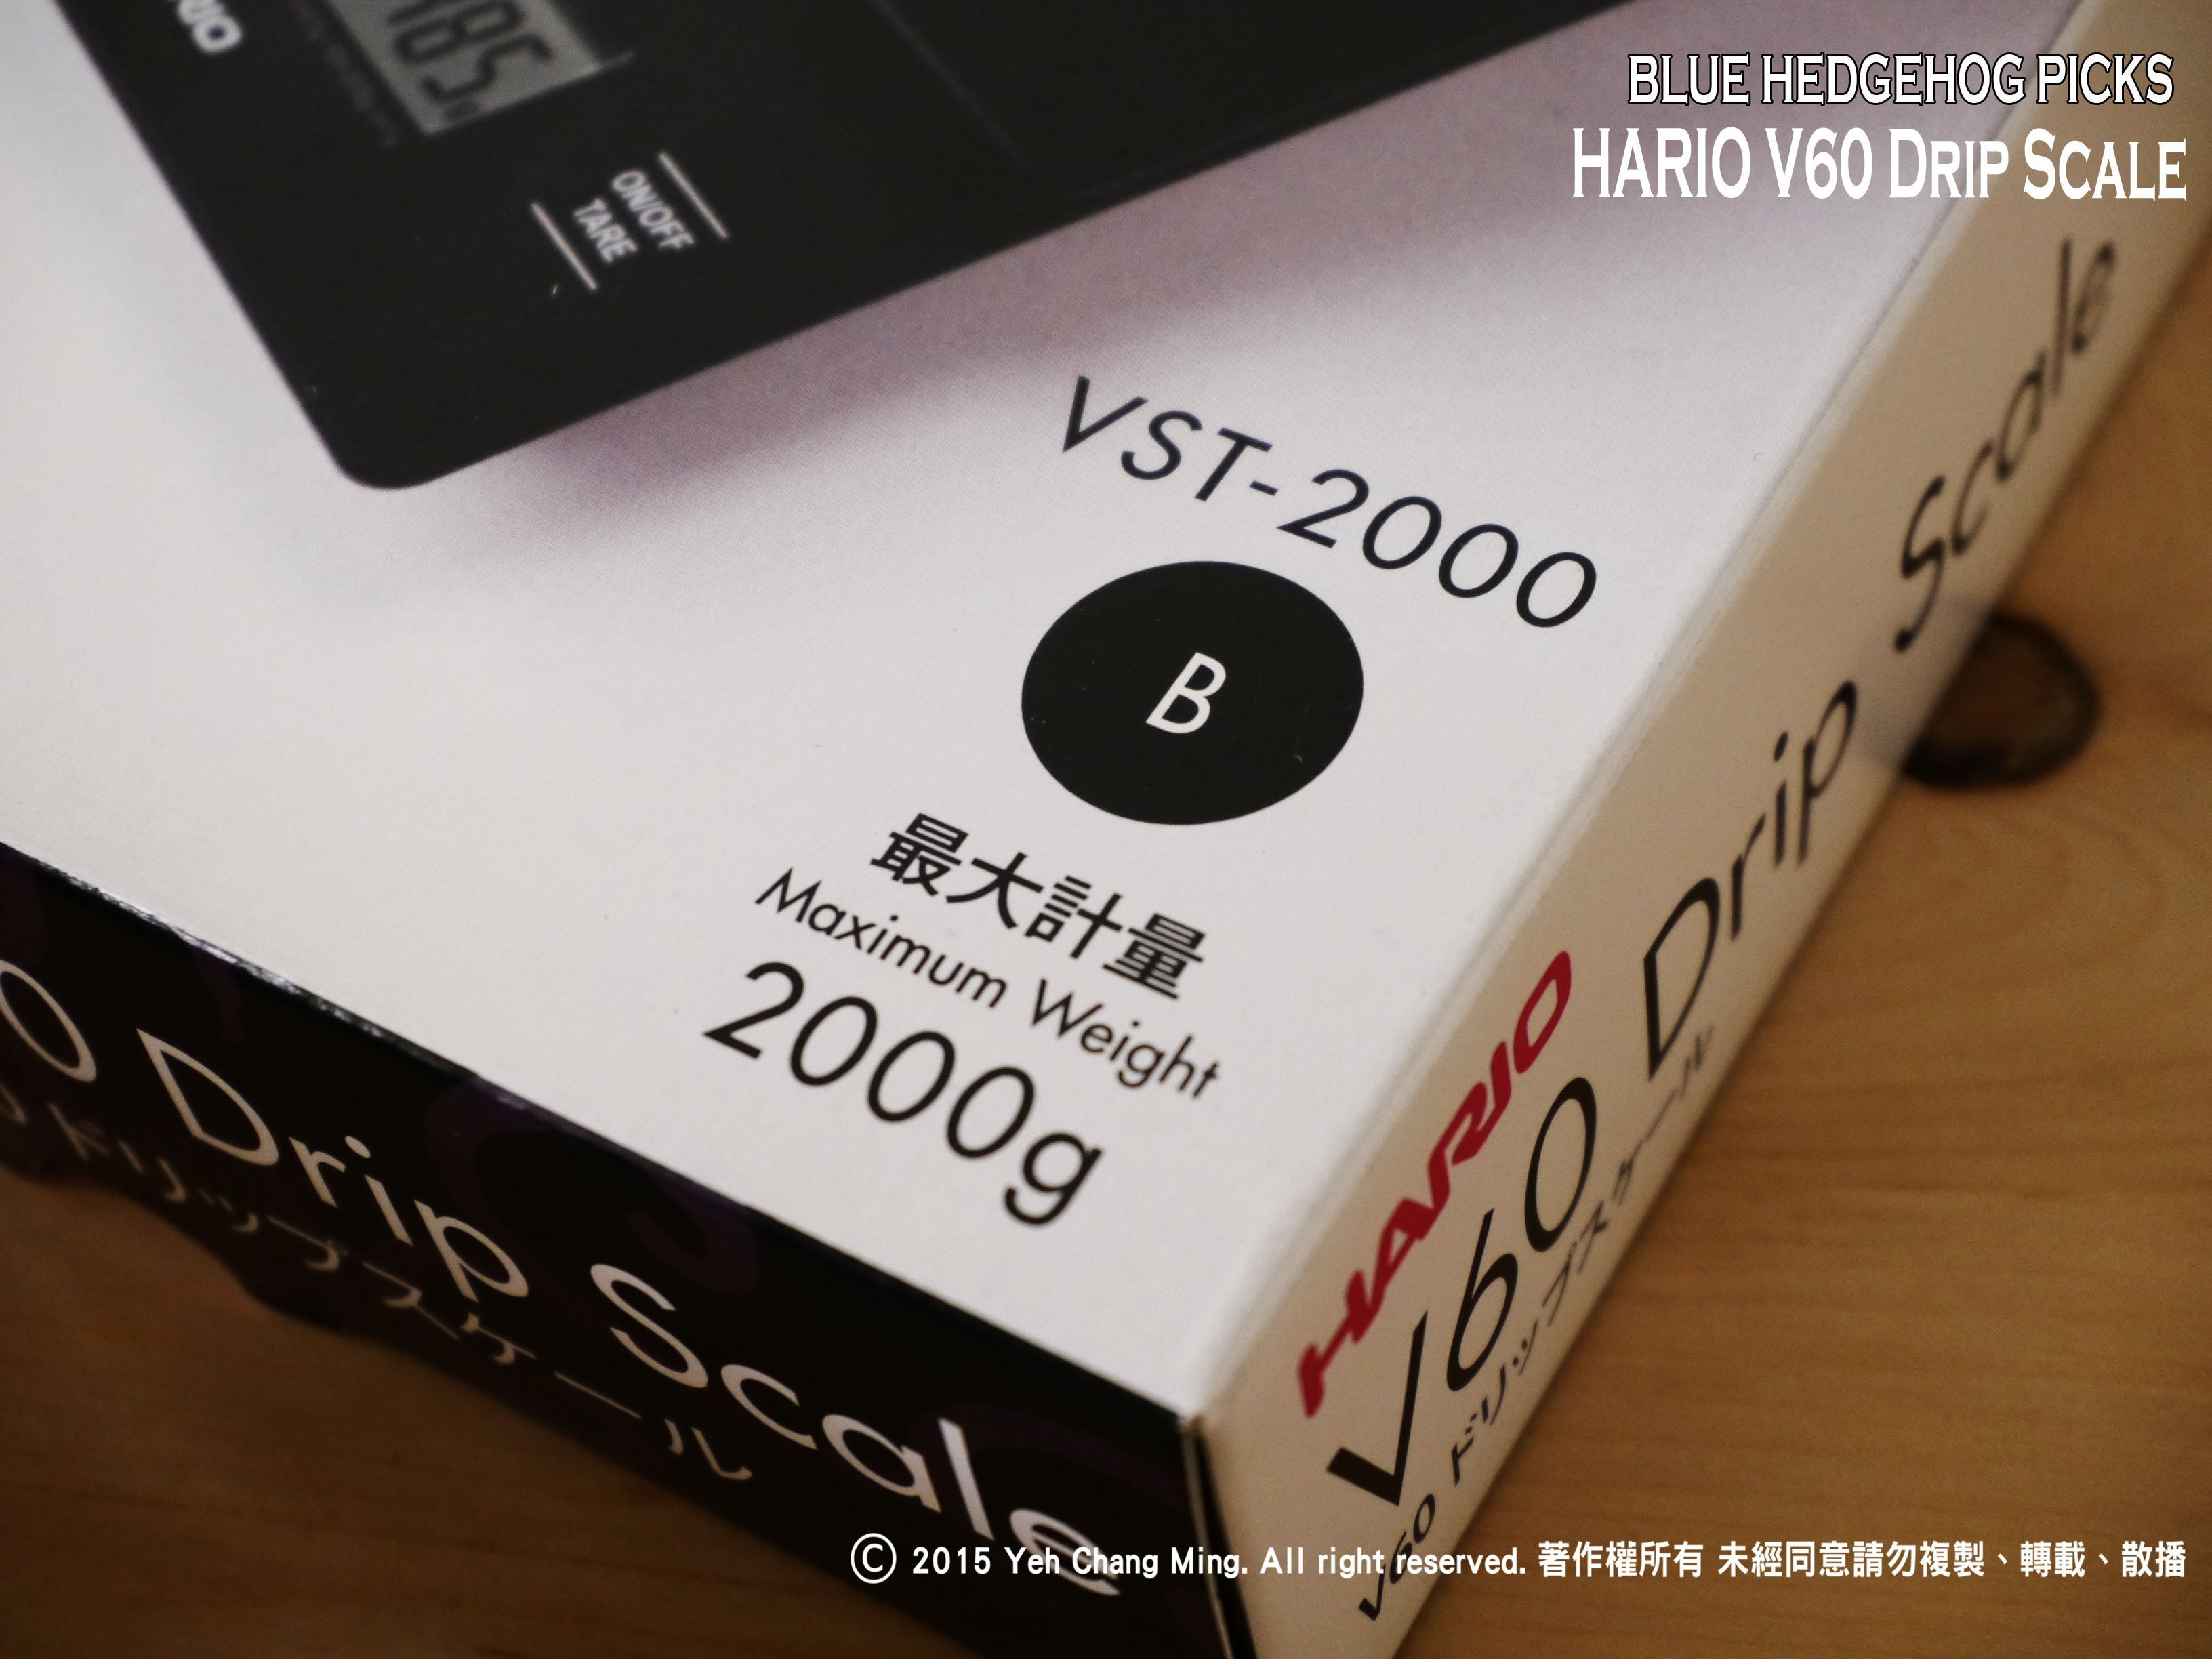 Hario V60 Vst 2000b Drip Scale